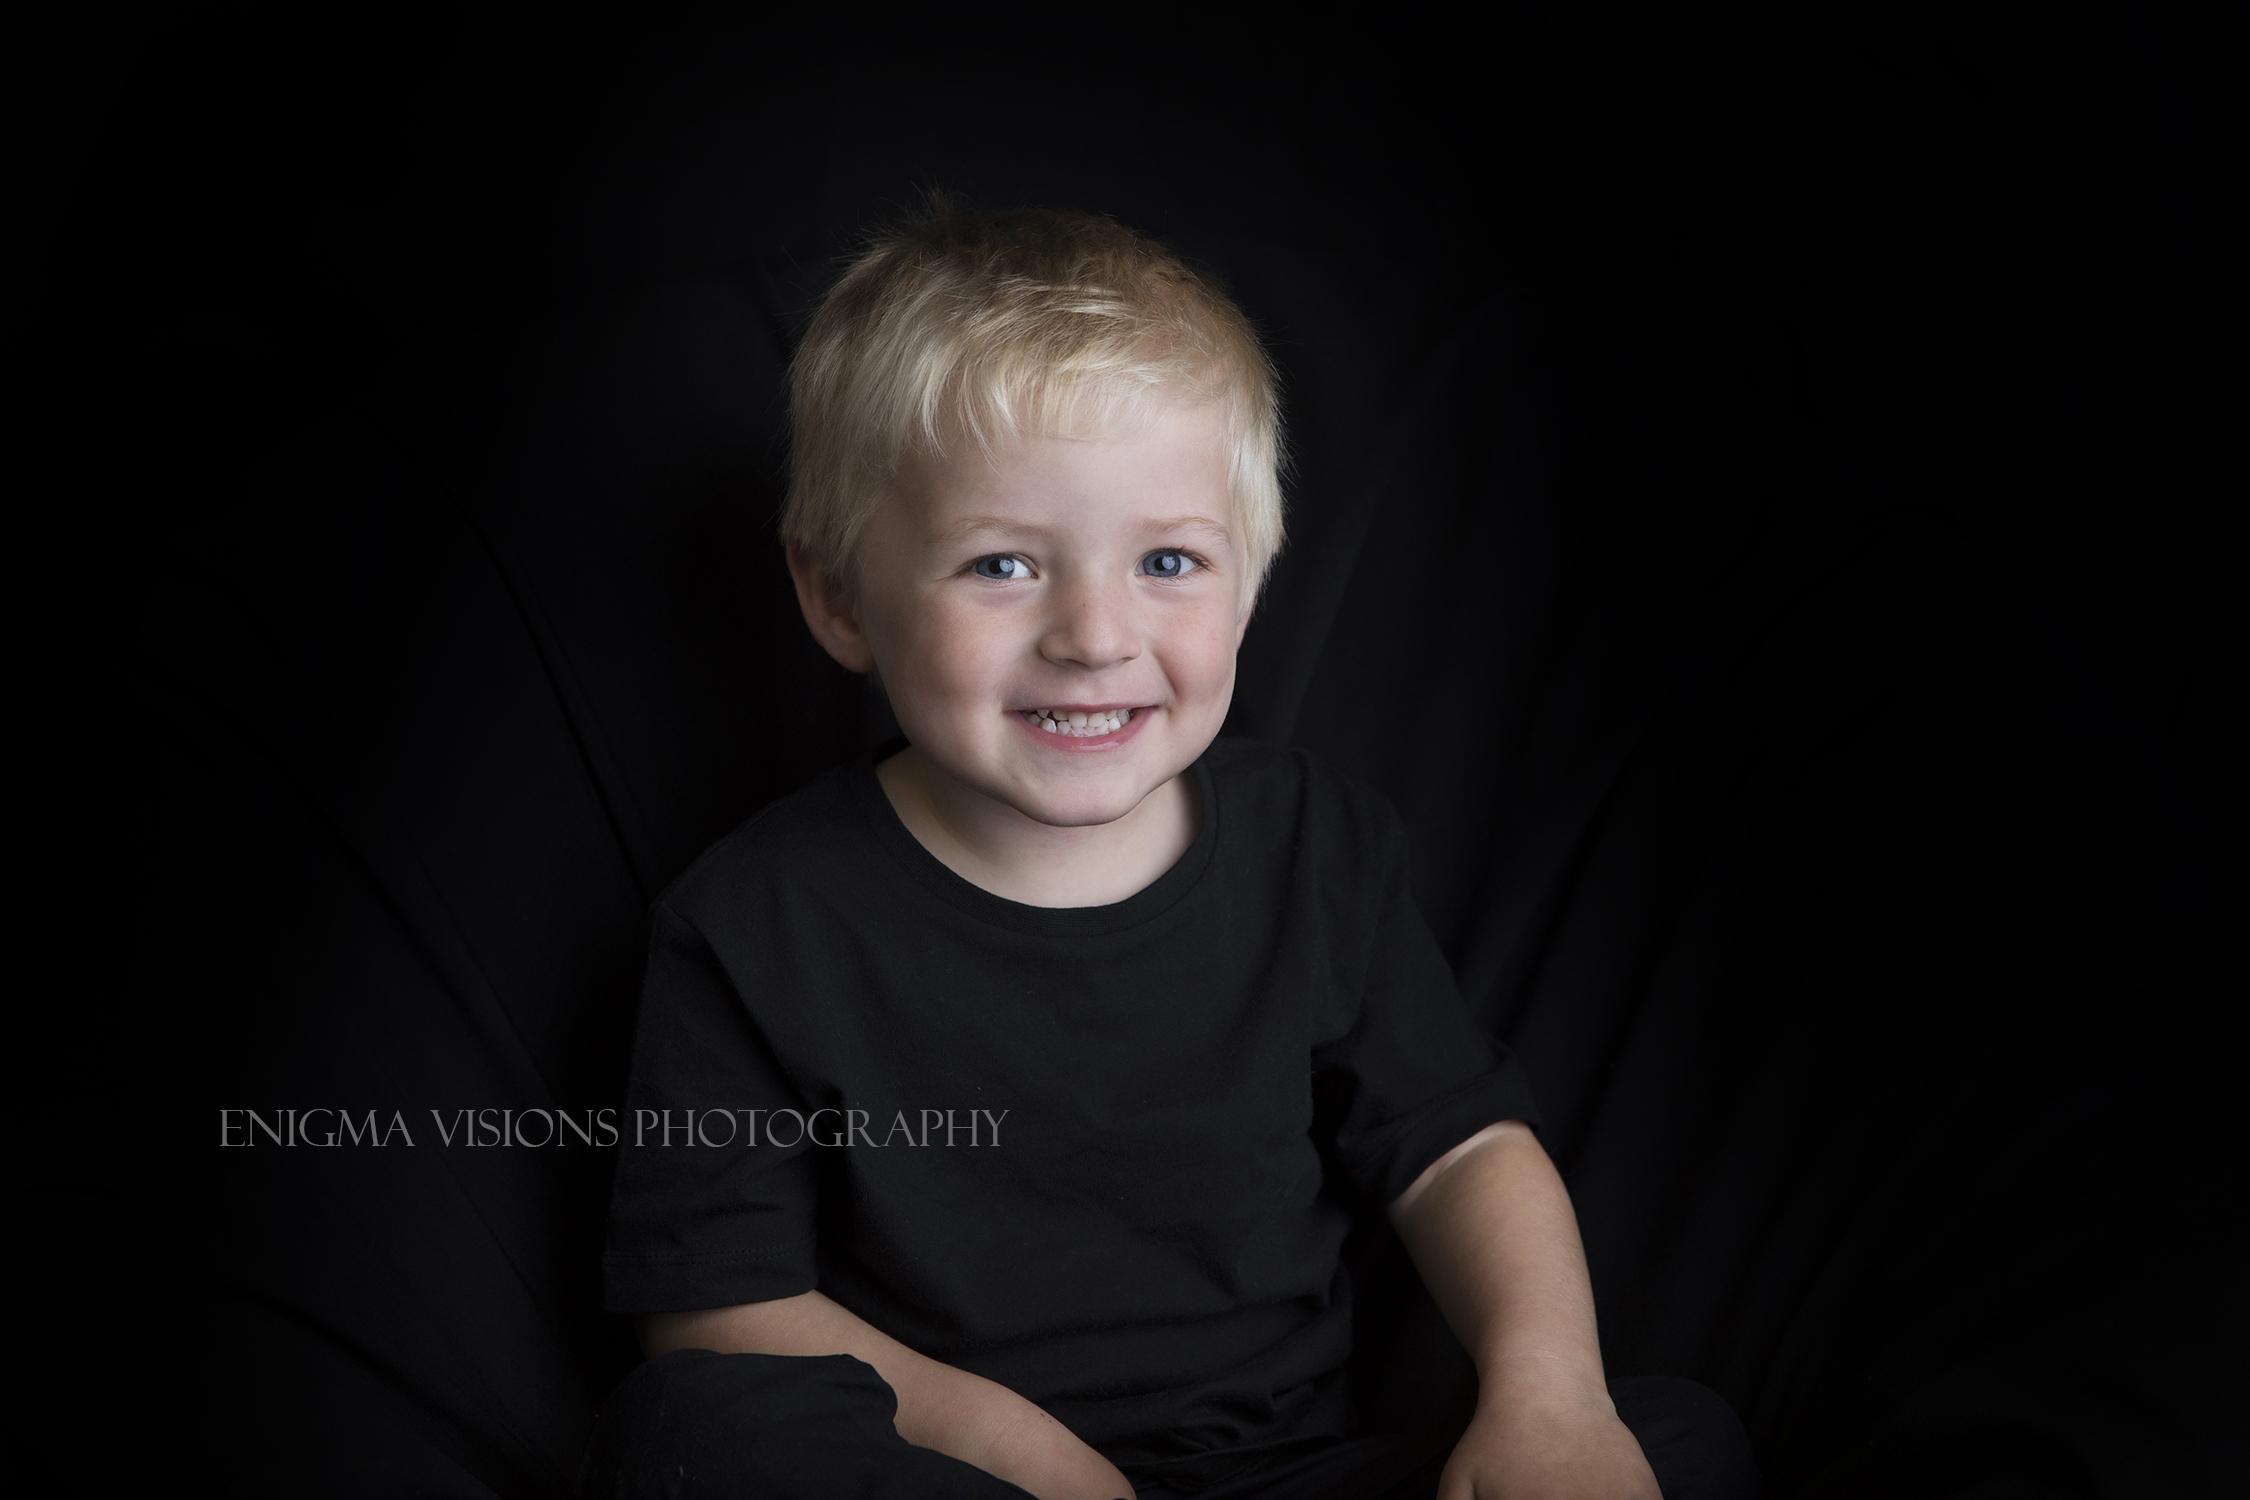 Newborn_Harvey_EnigmaVisionsPhotography (7).jpg